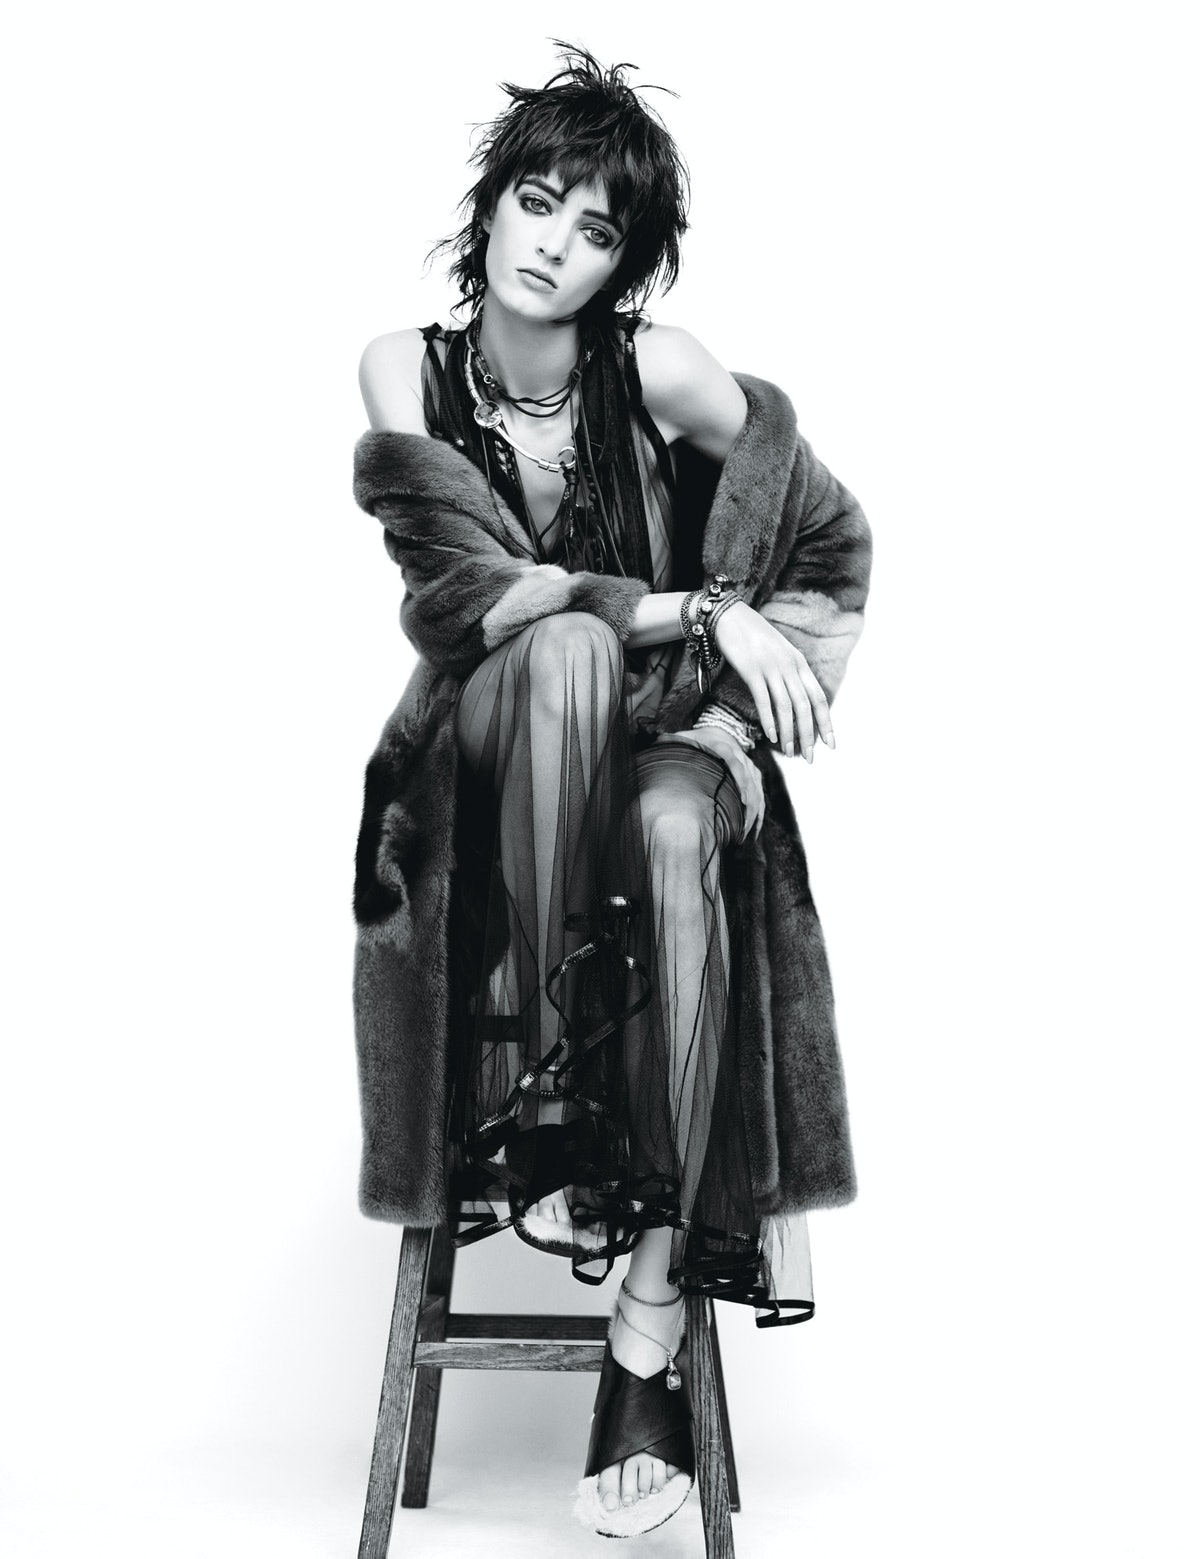 Rocker Fashion Inspiration